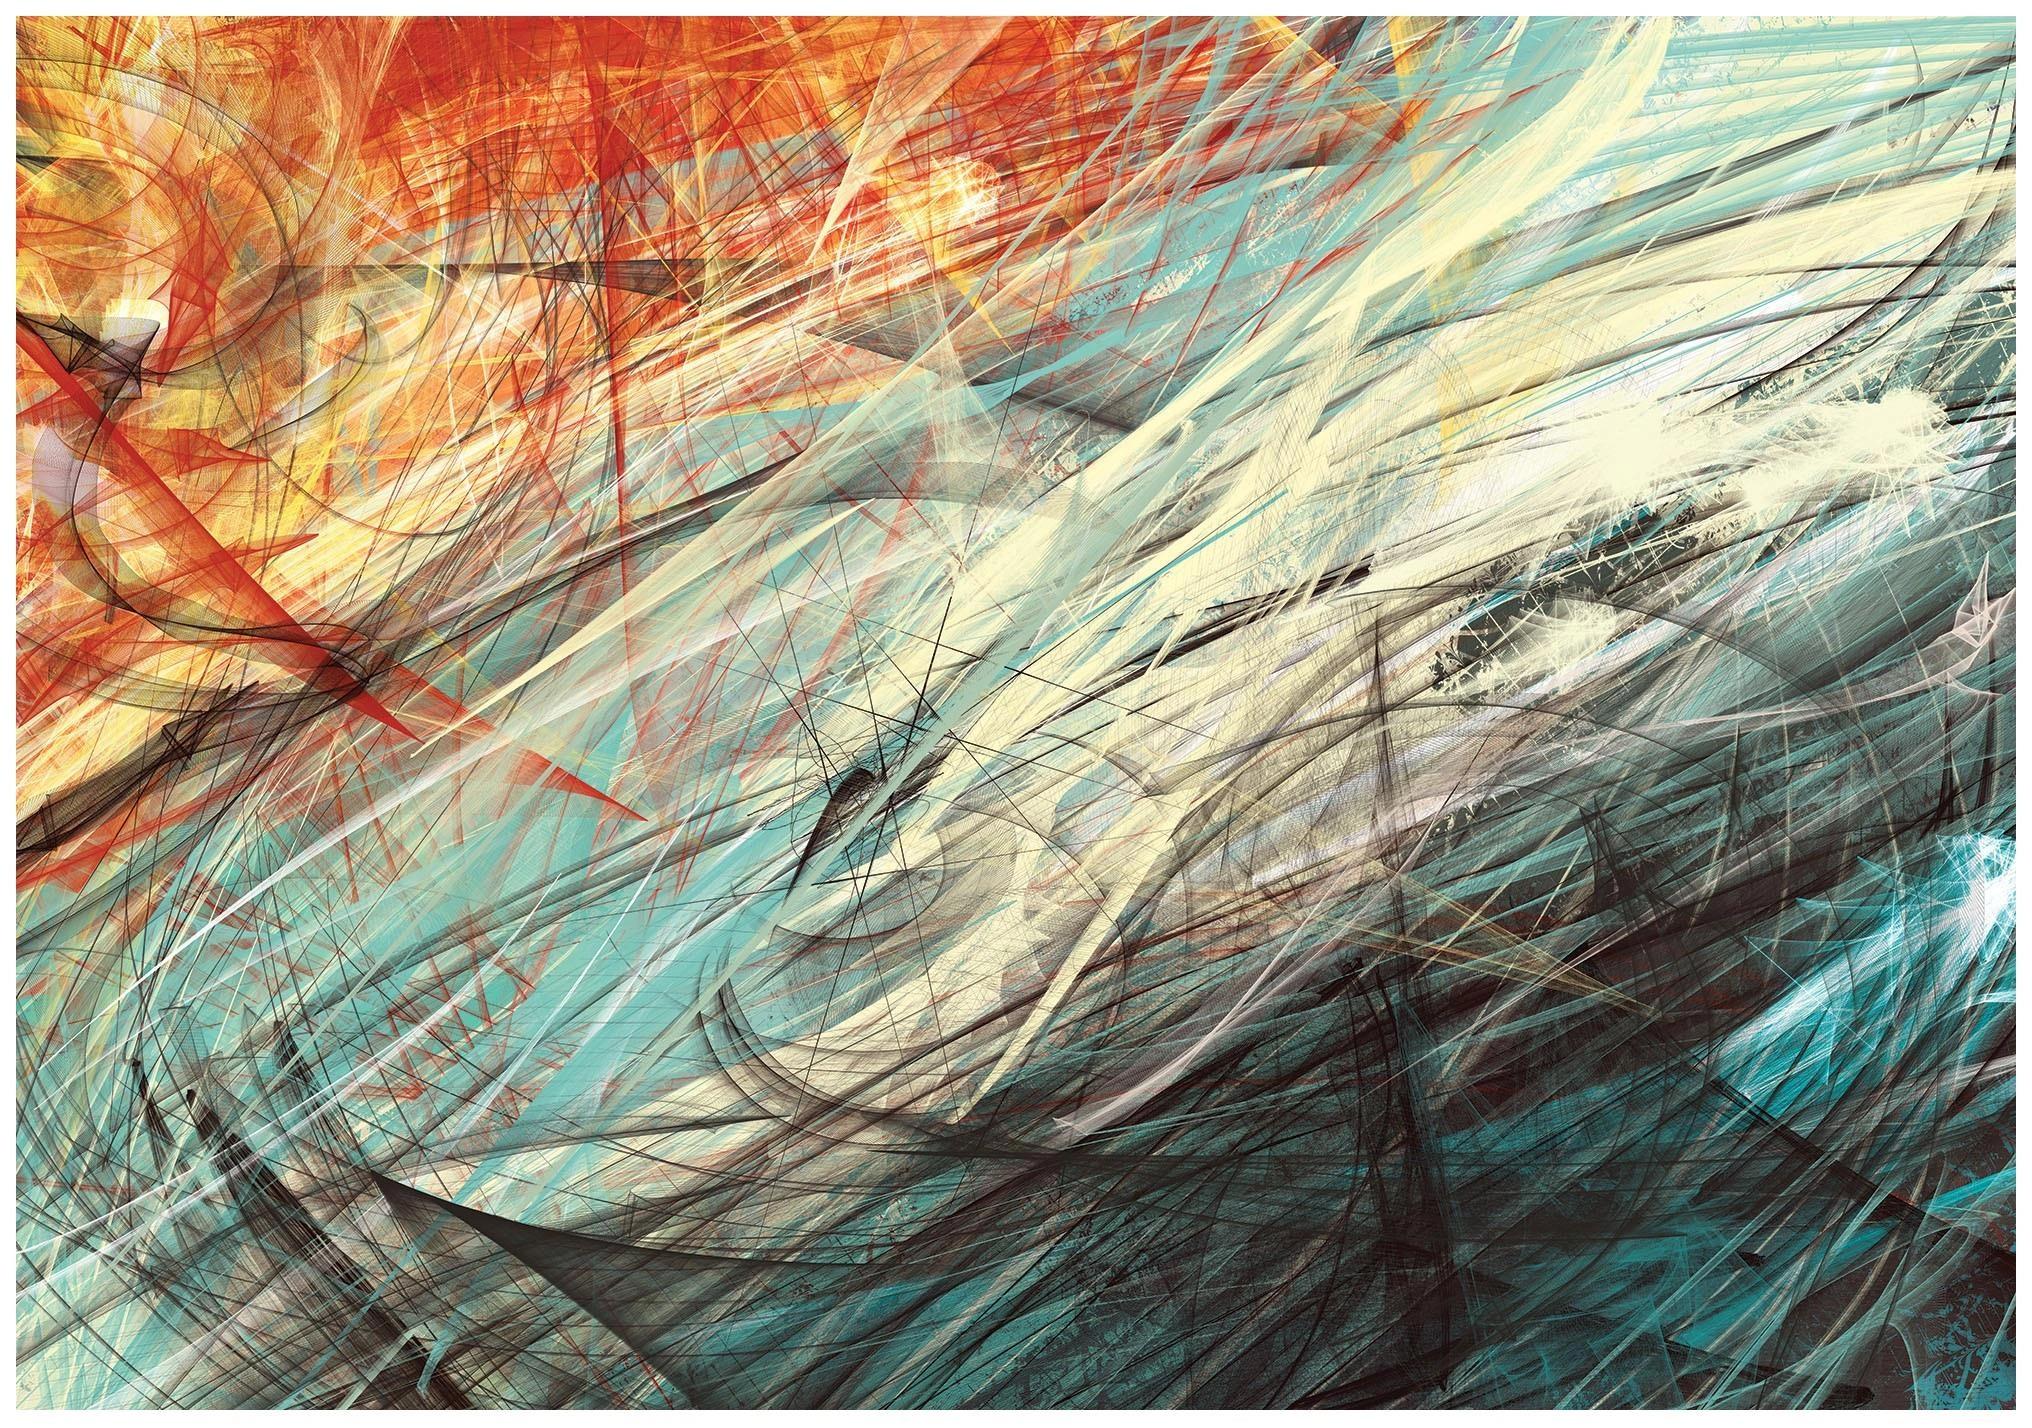 Fototapeta kolorowa abstrakcja malarska